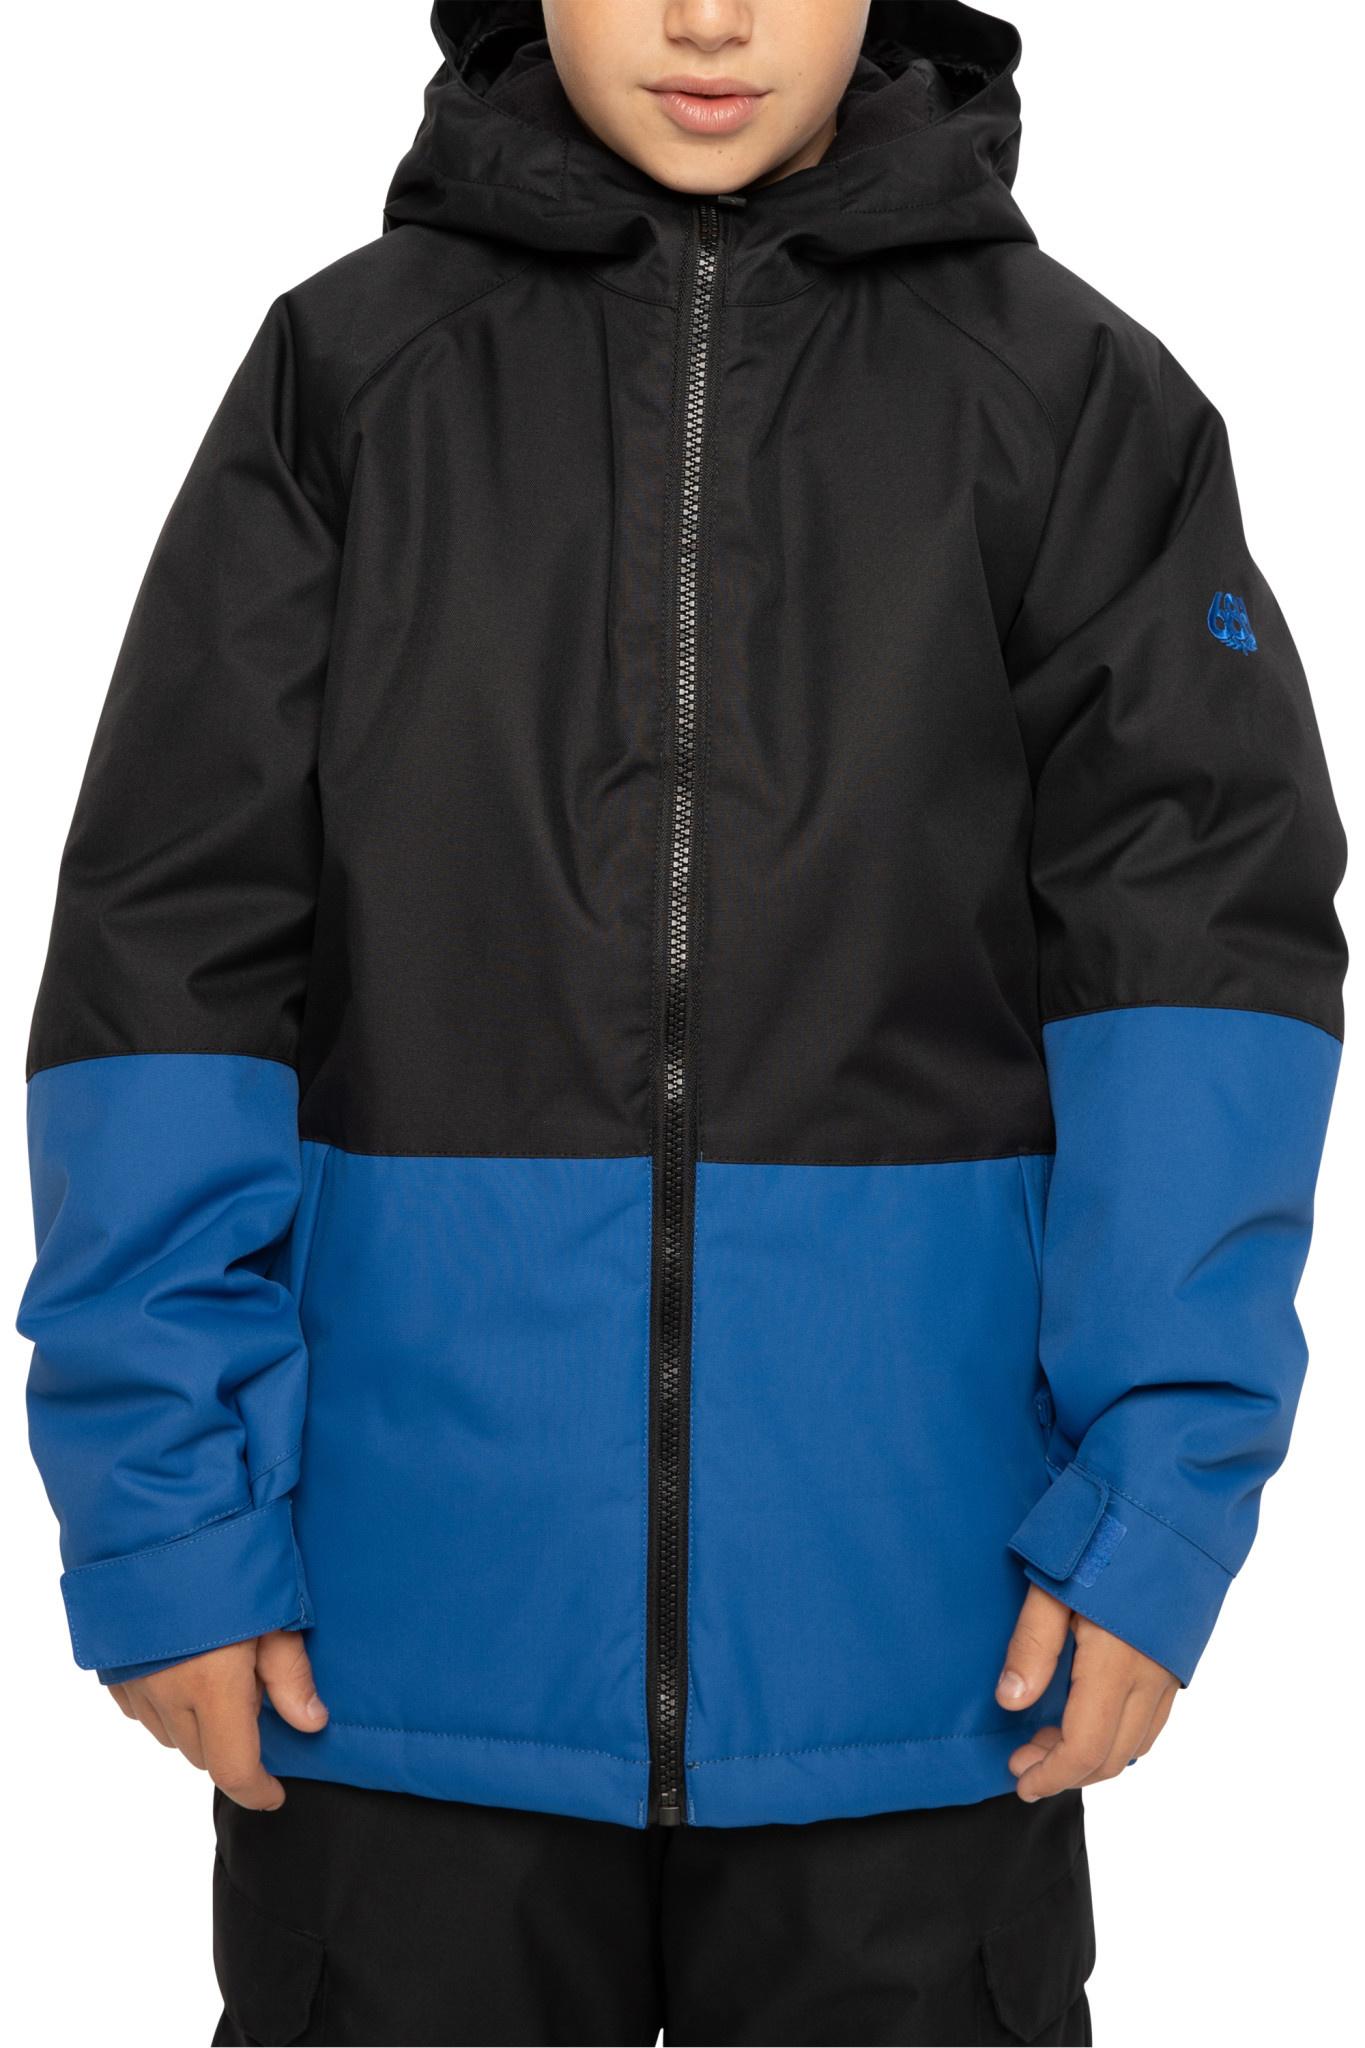 686 686 Boys Insulated Snow Jacket